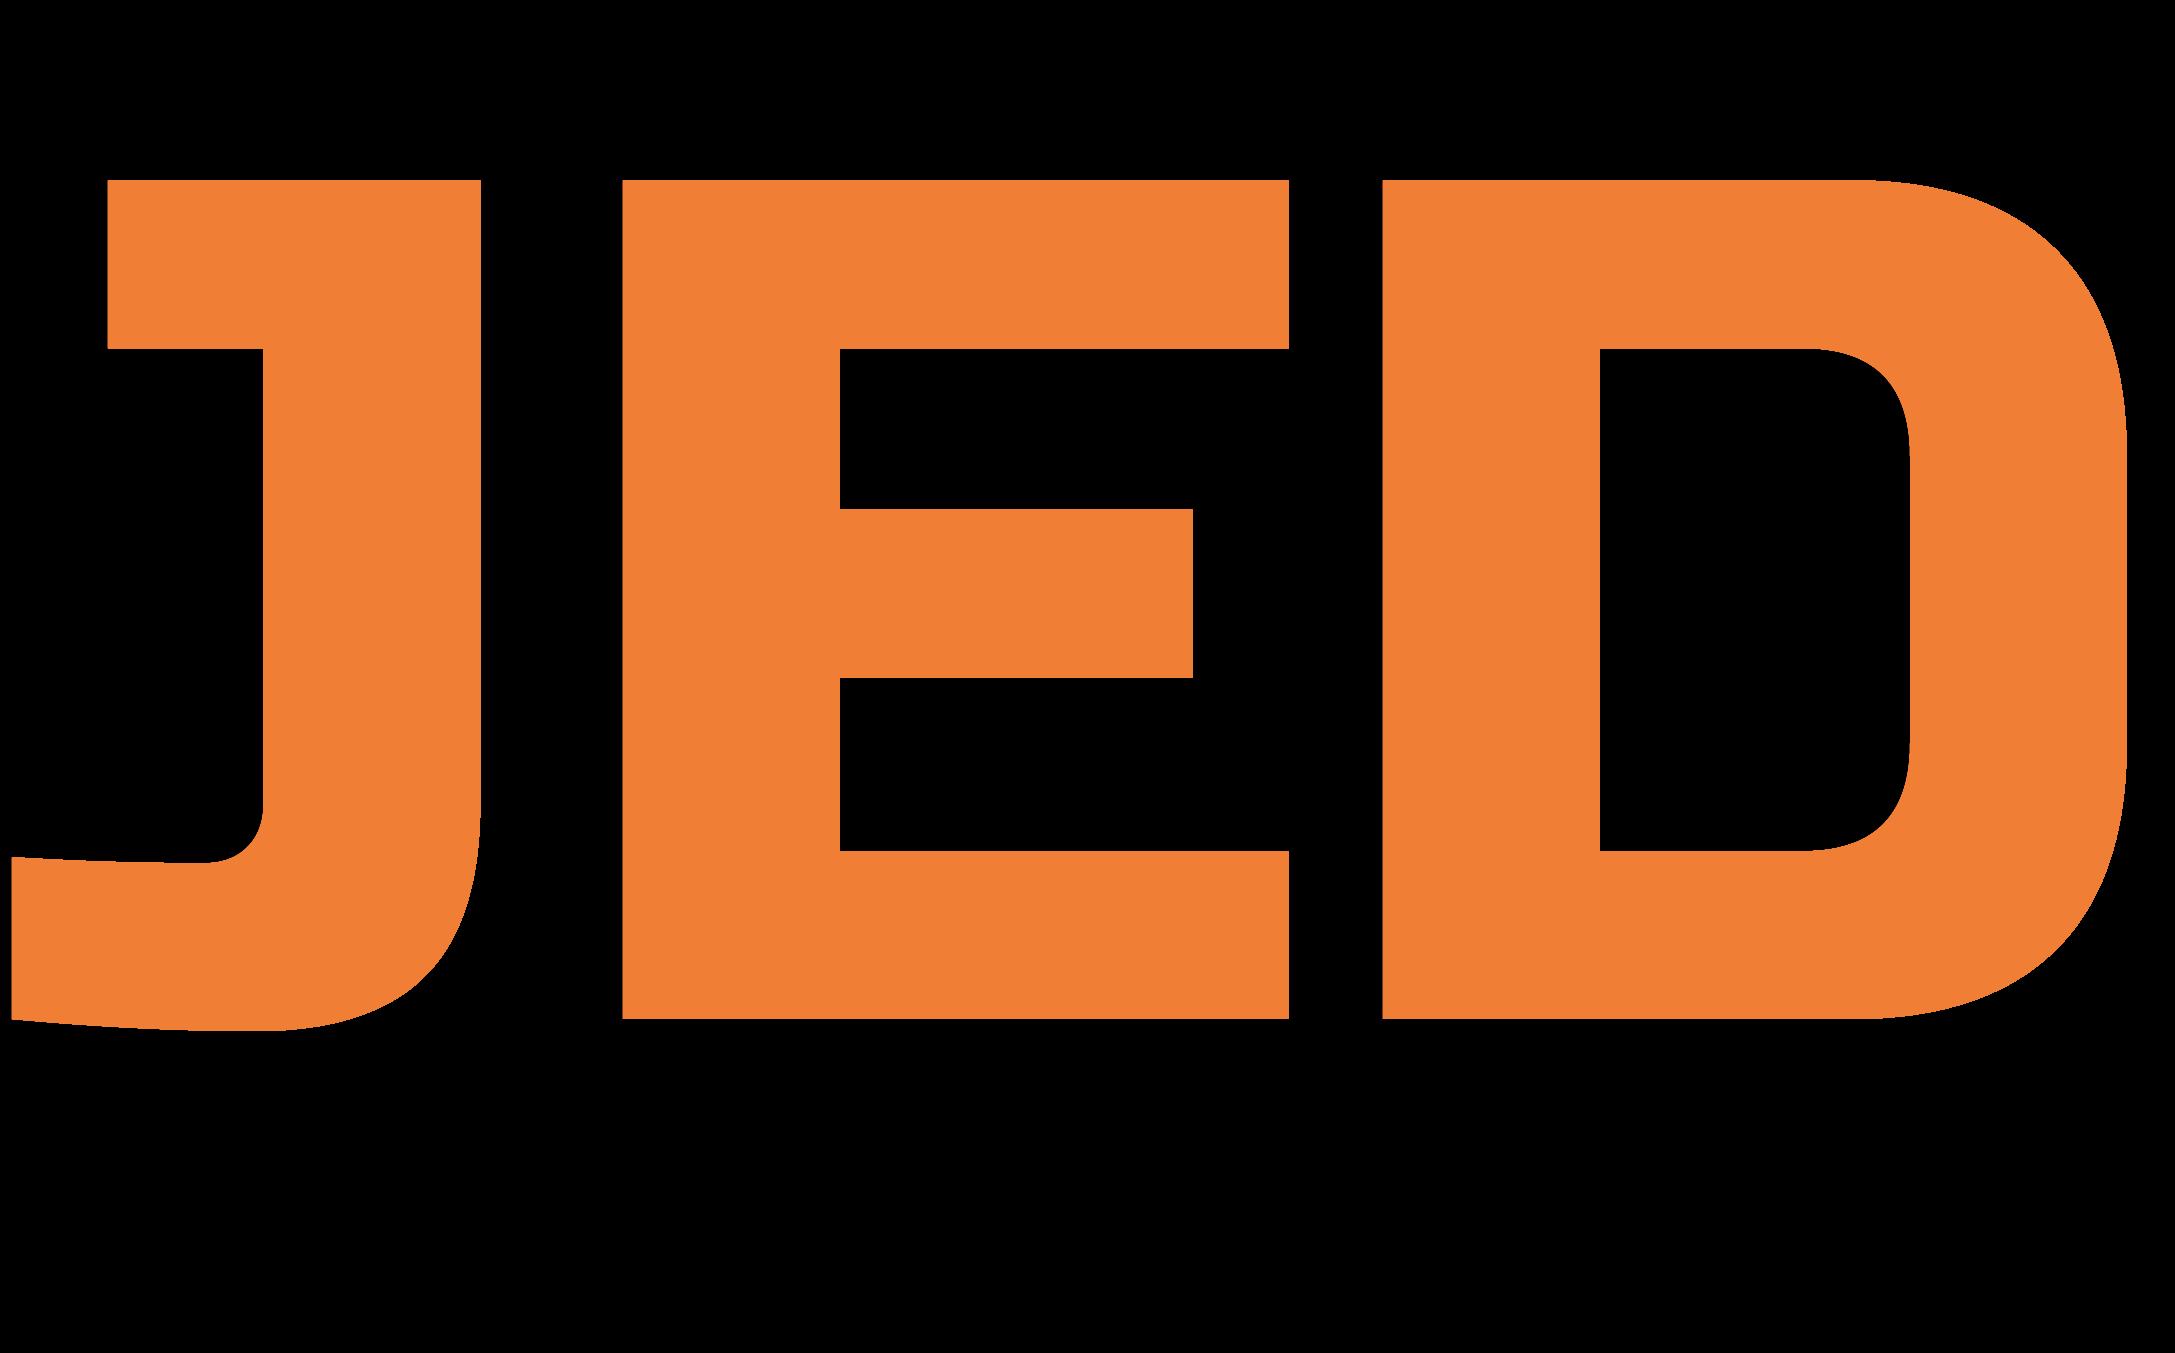 JedThai